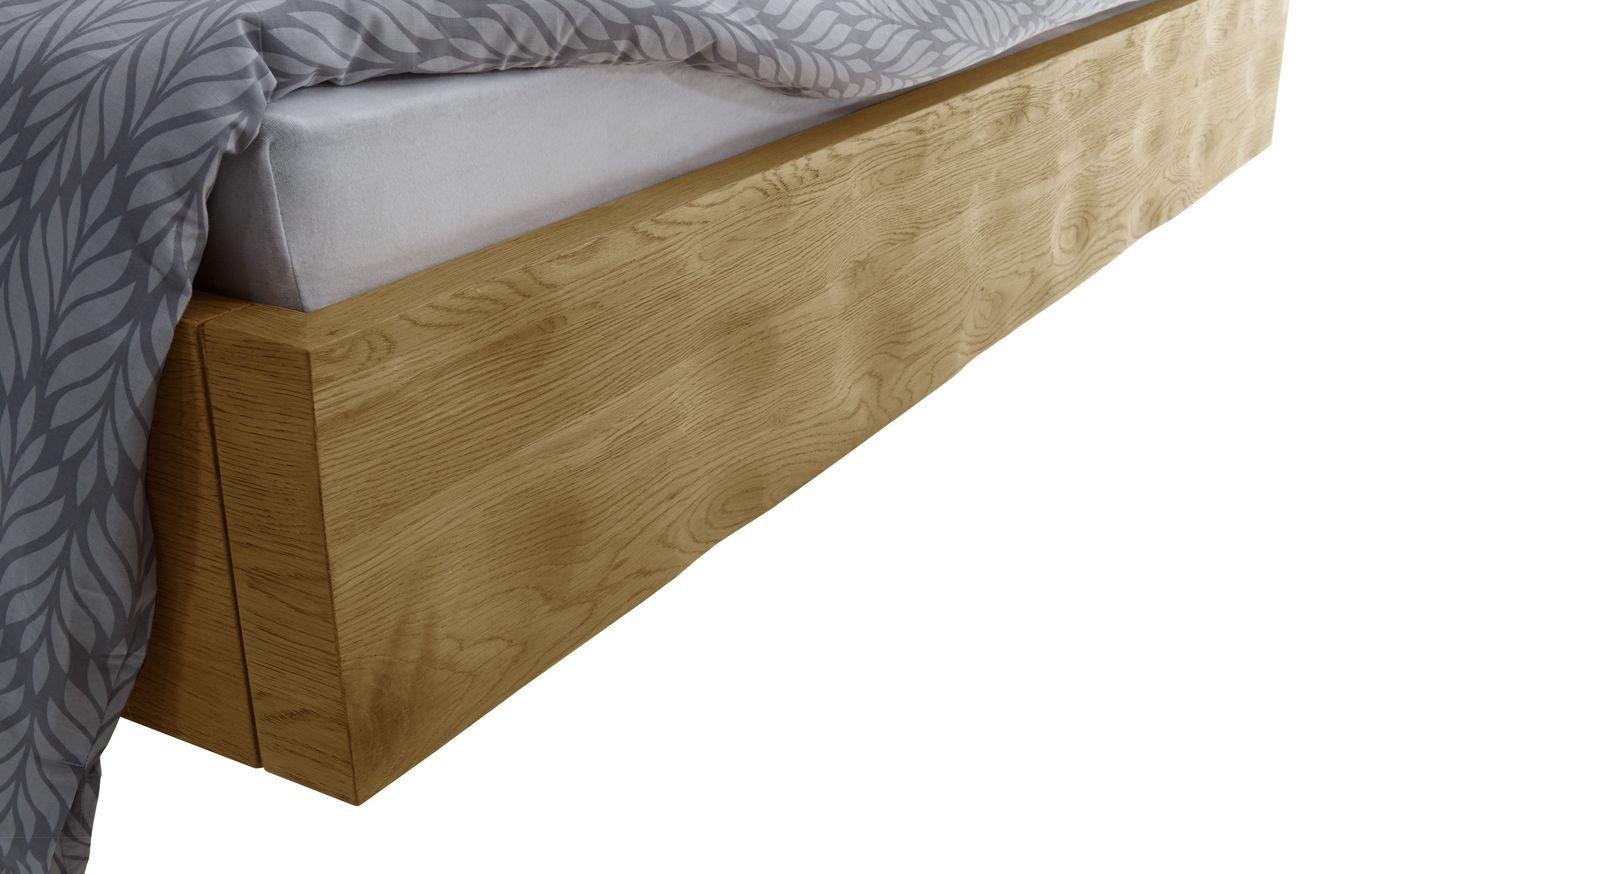 Holzbett mit unebener Oberfläche